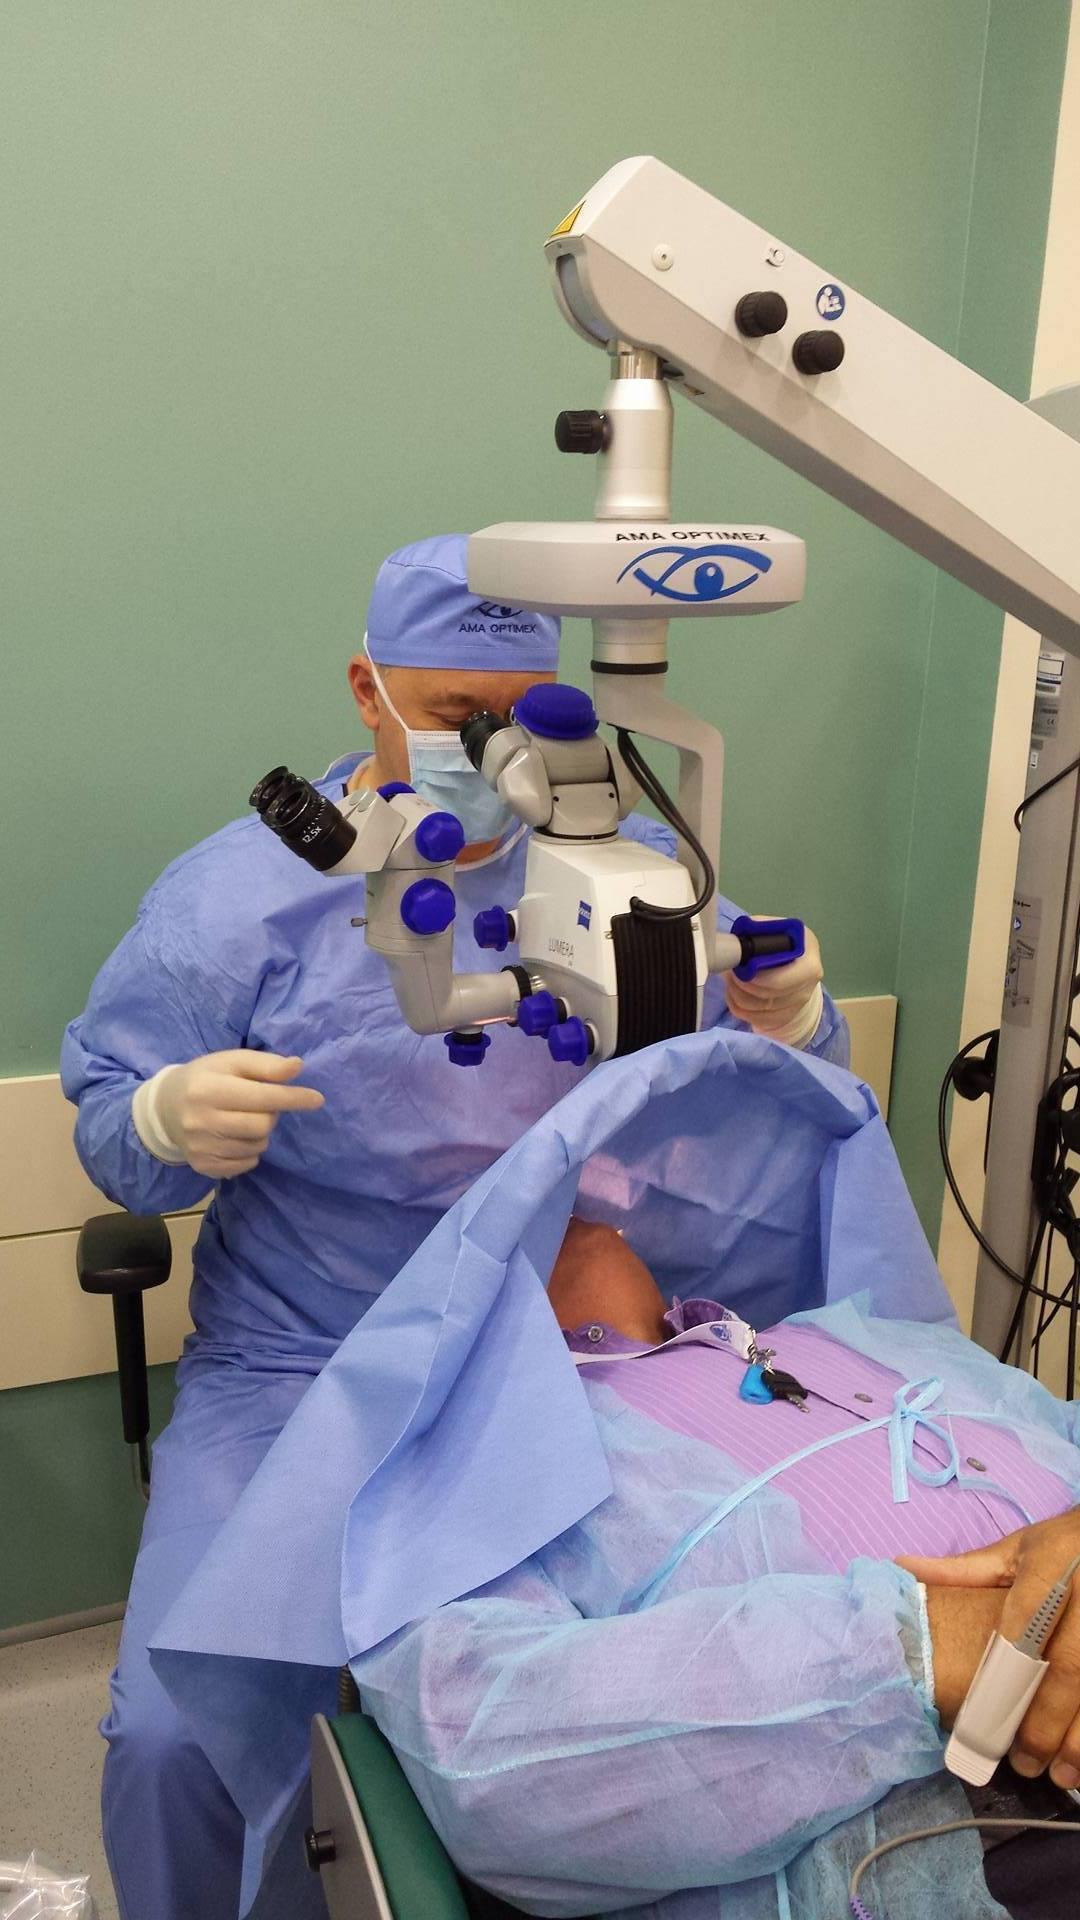 Cataracta: Simptome, Factori de risc & Tratament | 7-pitici.ro